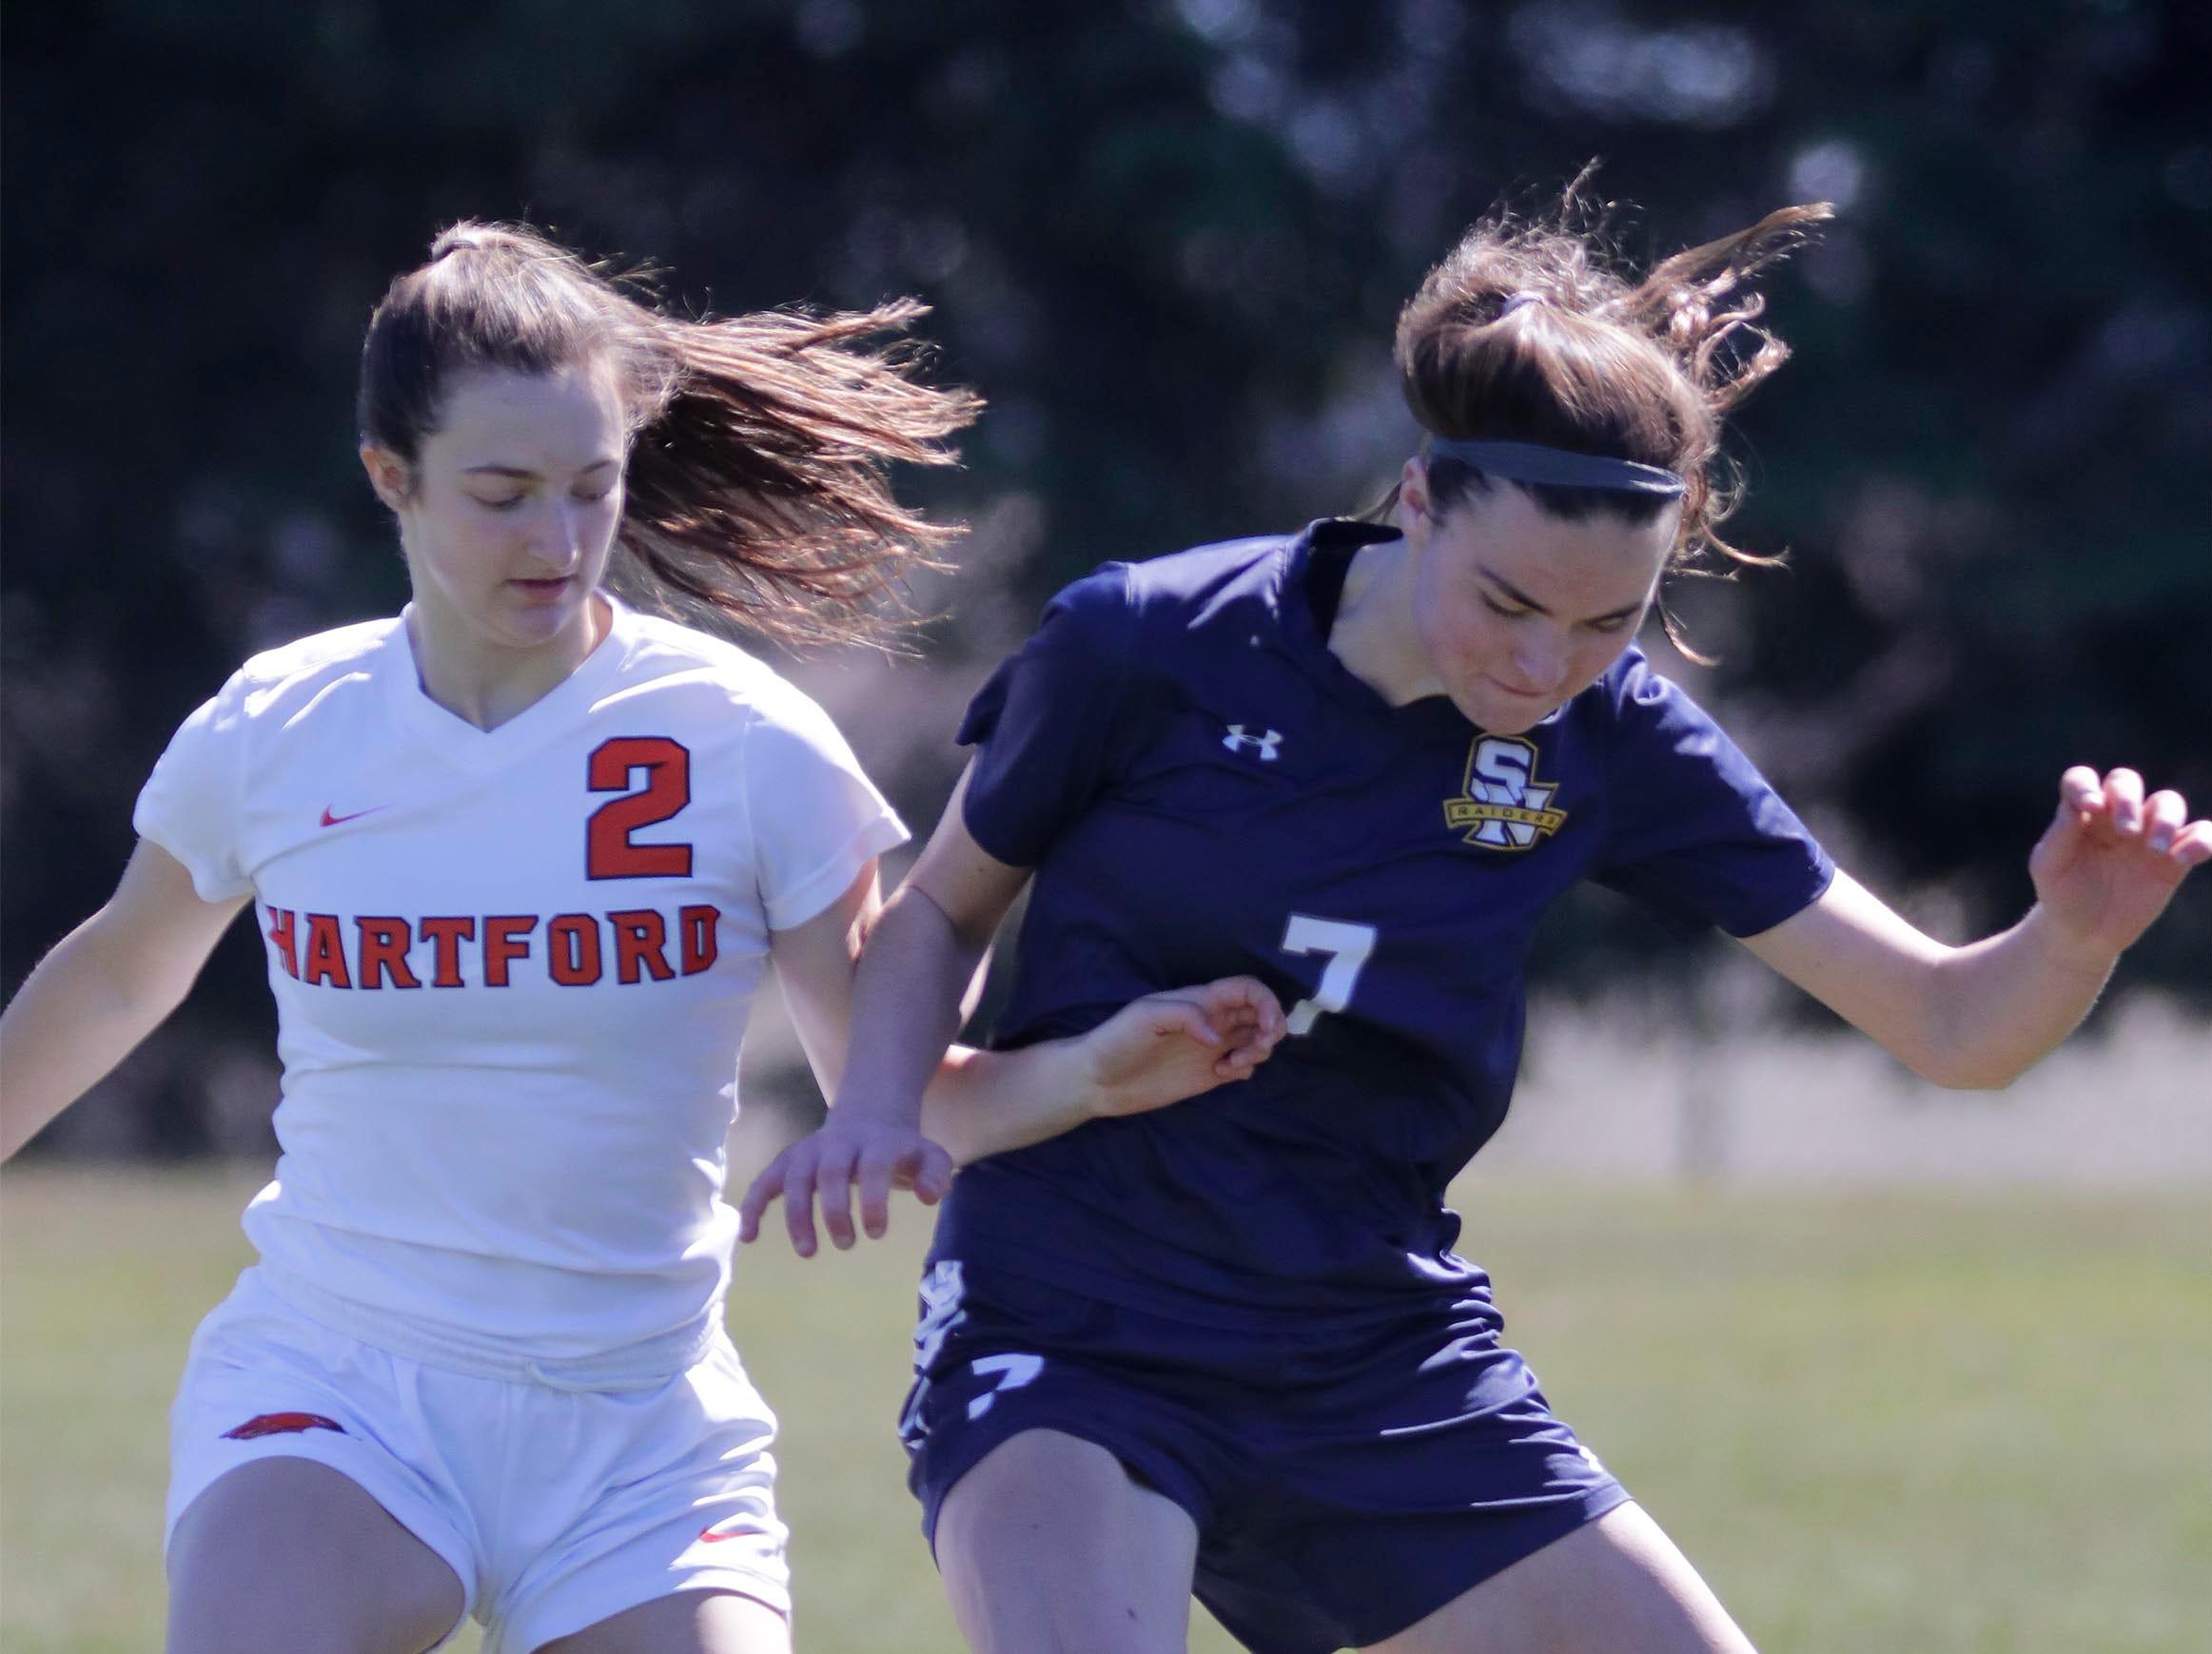 Hartford's Becca Stoeckmann (2) observes as Sheboygan North's Ashley English (7) maneuvers the ball, at the Sheboygan South Soccer tournament, Saturday, April 20, 2019, in Sheboygan, Wis.